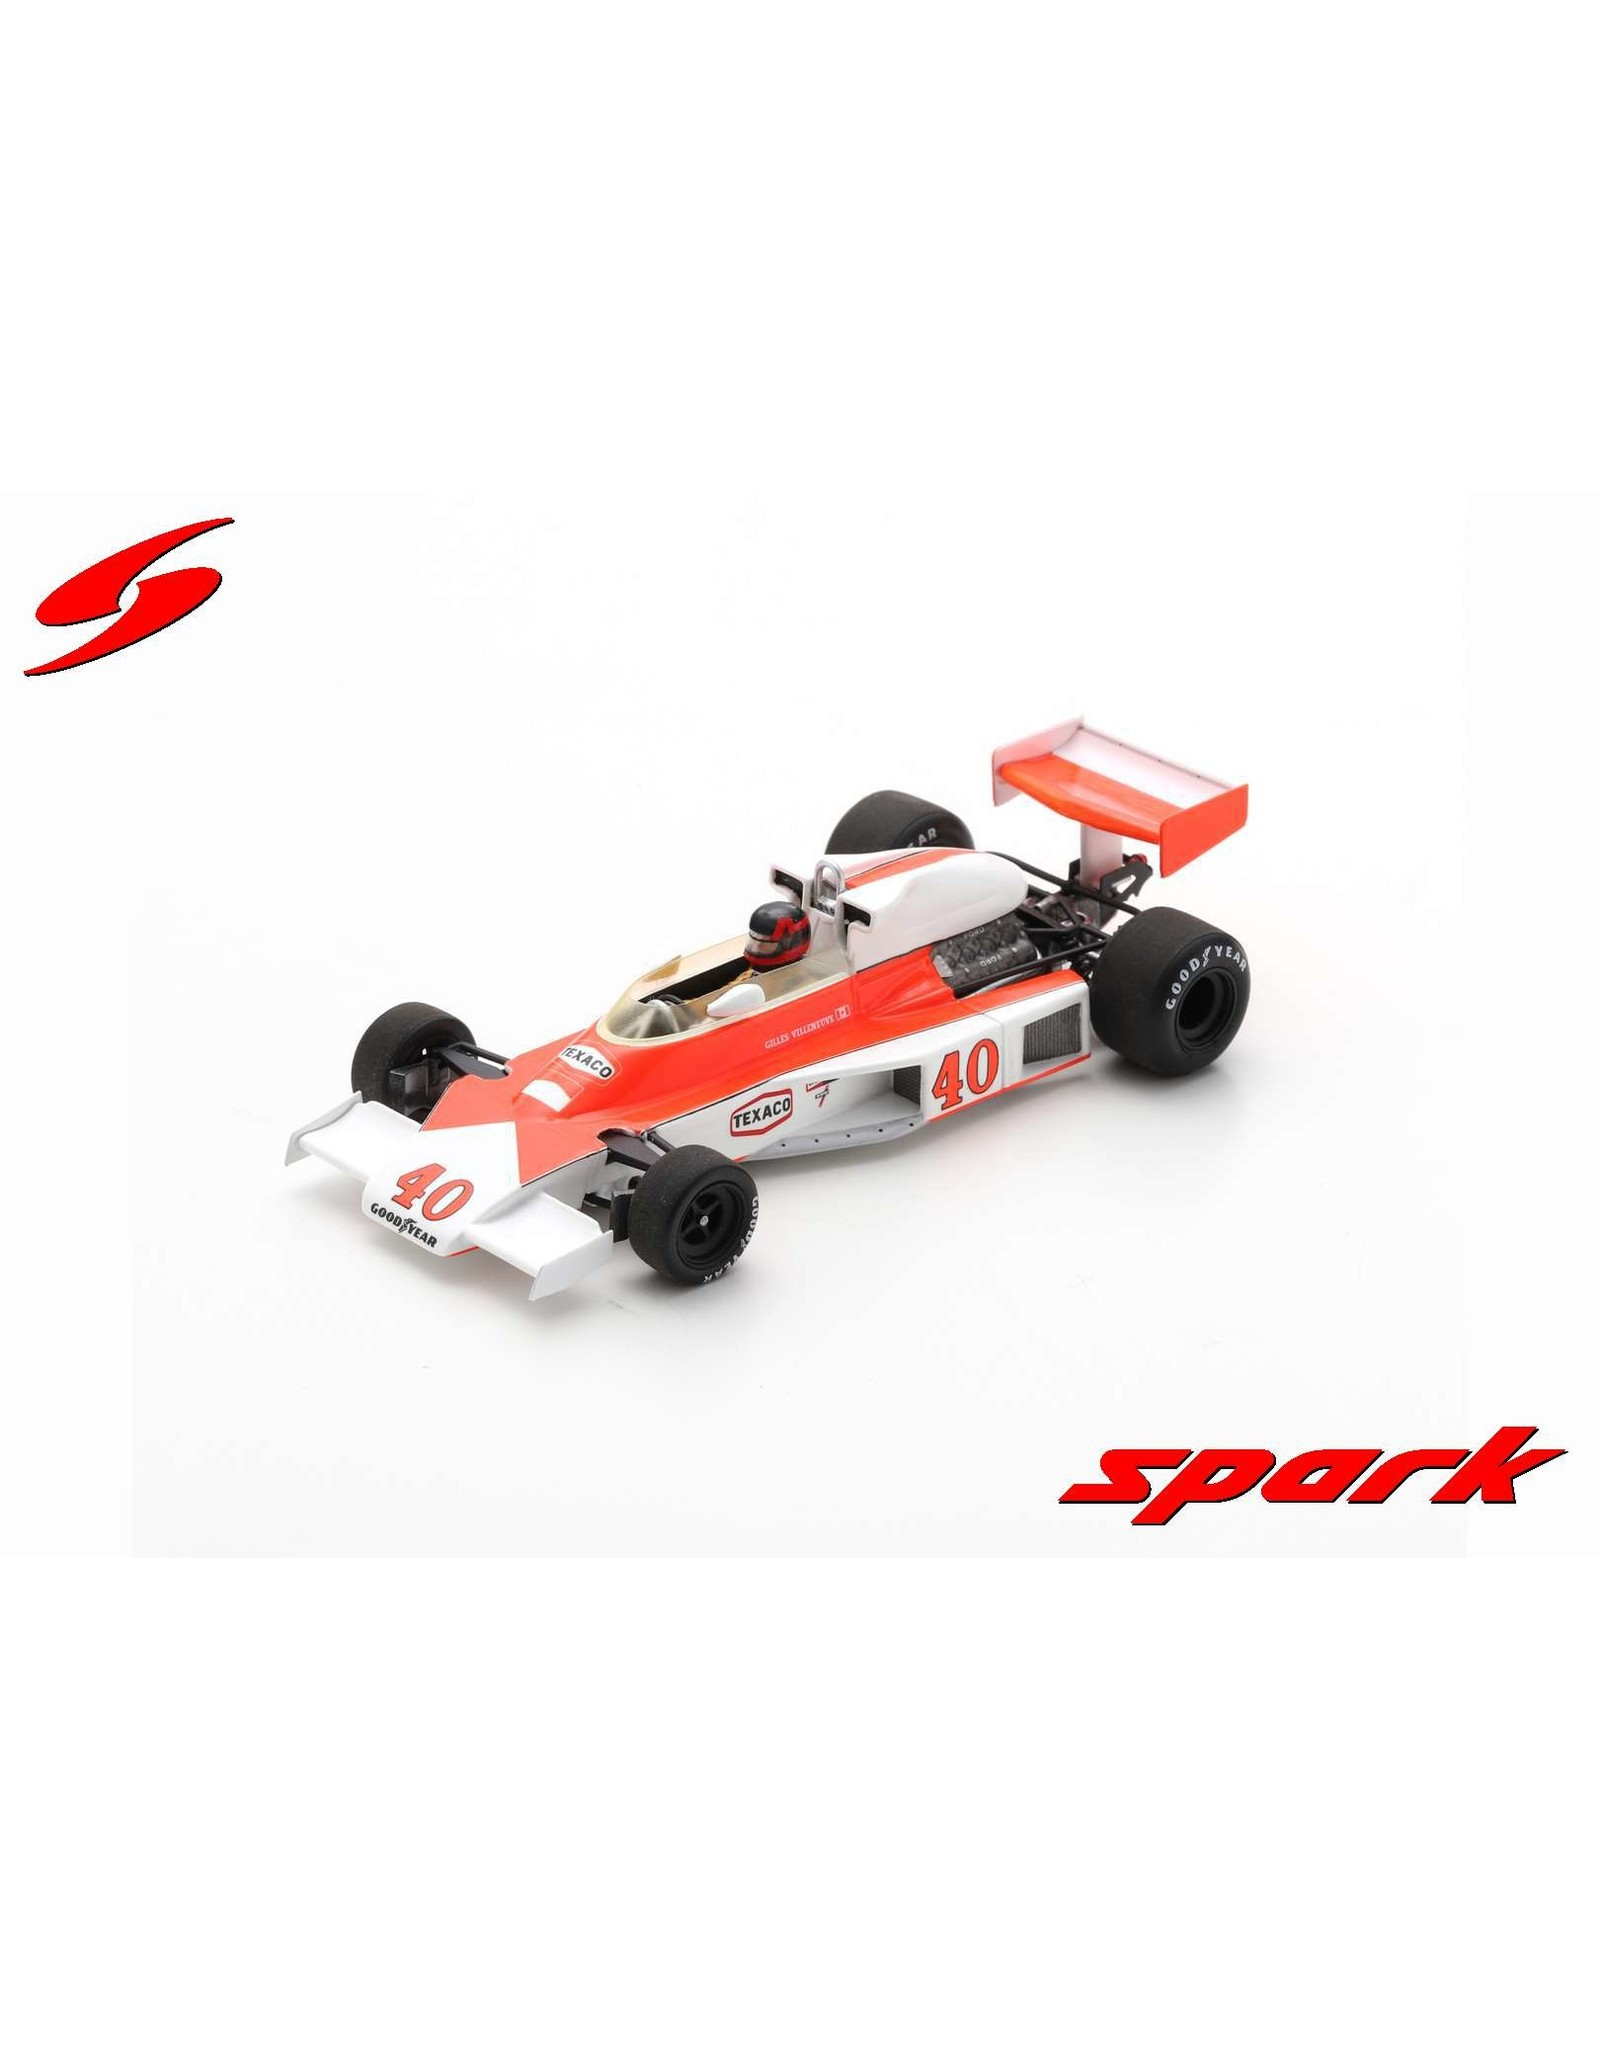 Formule 1 Formule 1 Mc Laren M23 #40 GP UK 1977 - 1:43 - Spark